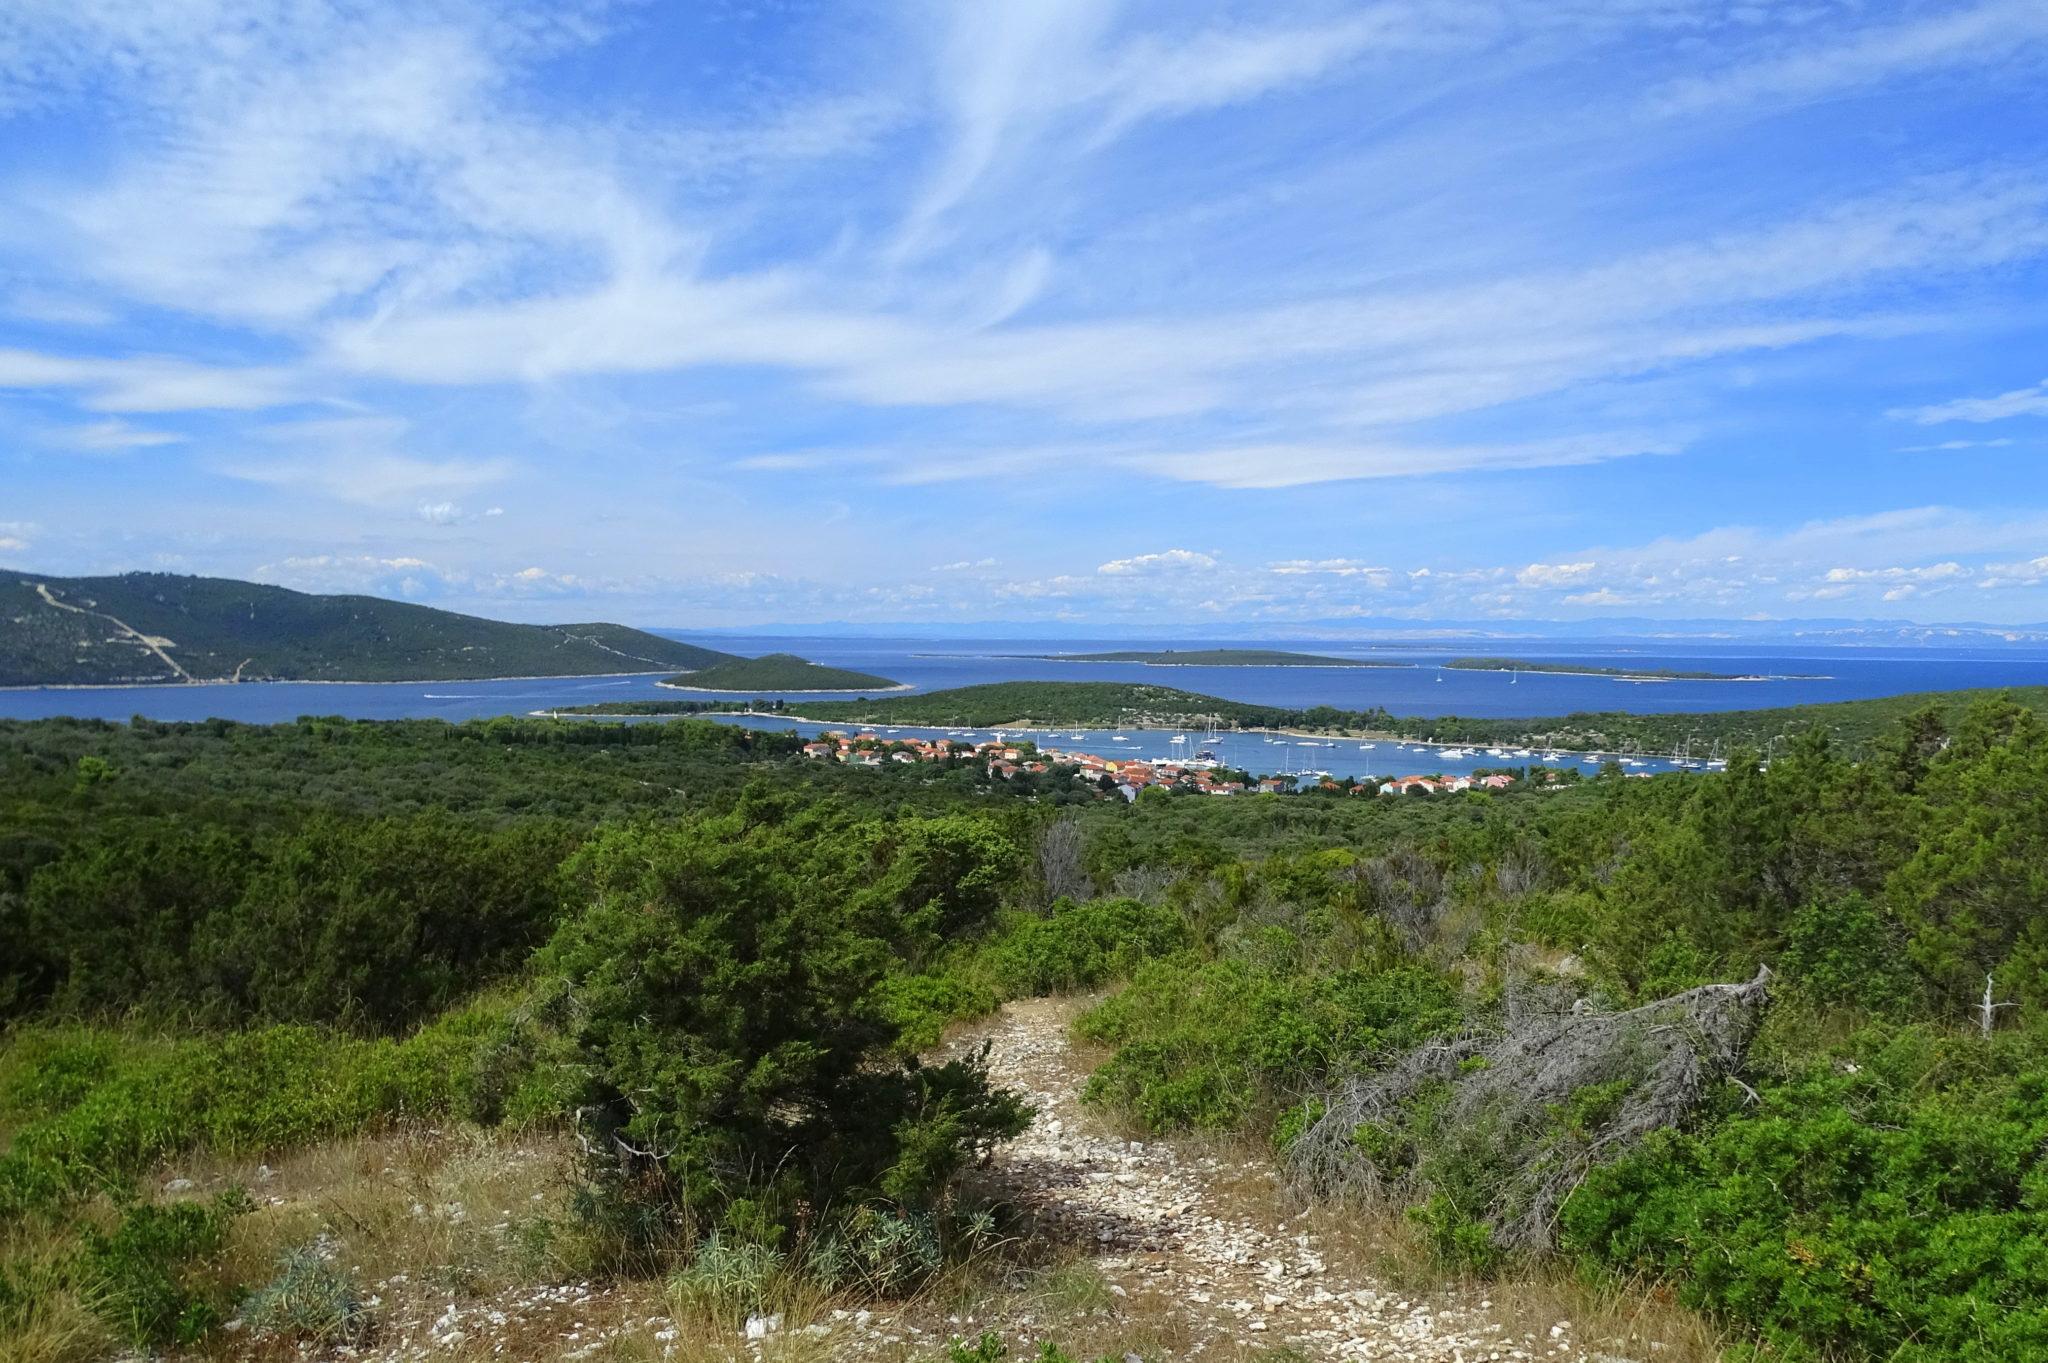 View of the Ilovik village